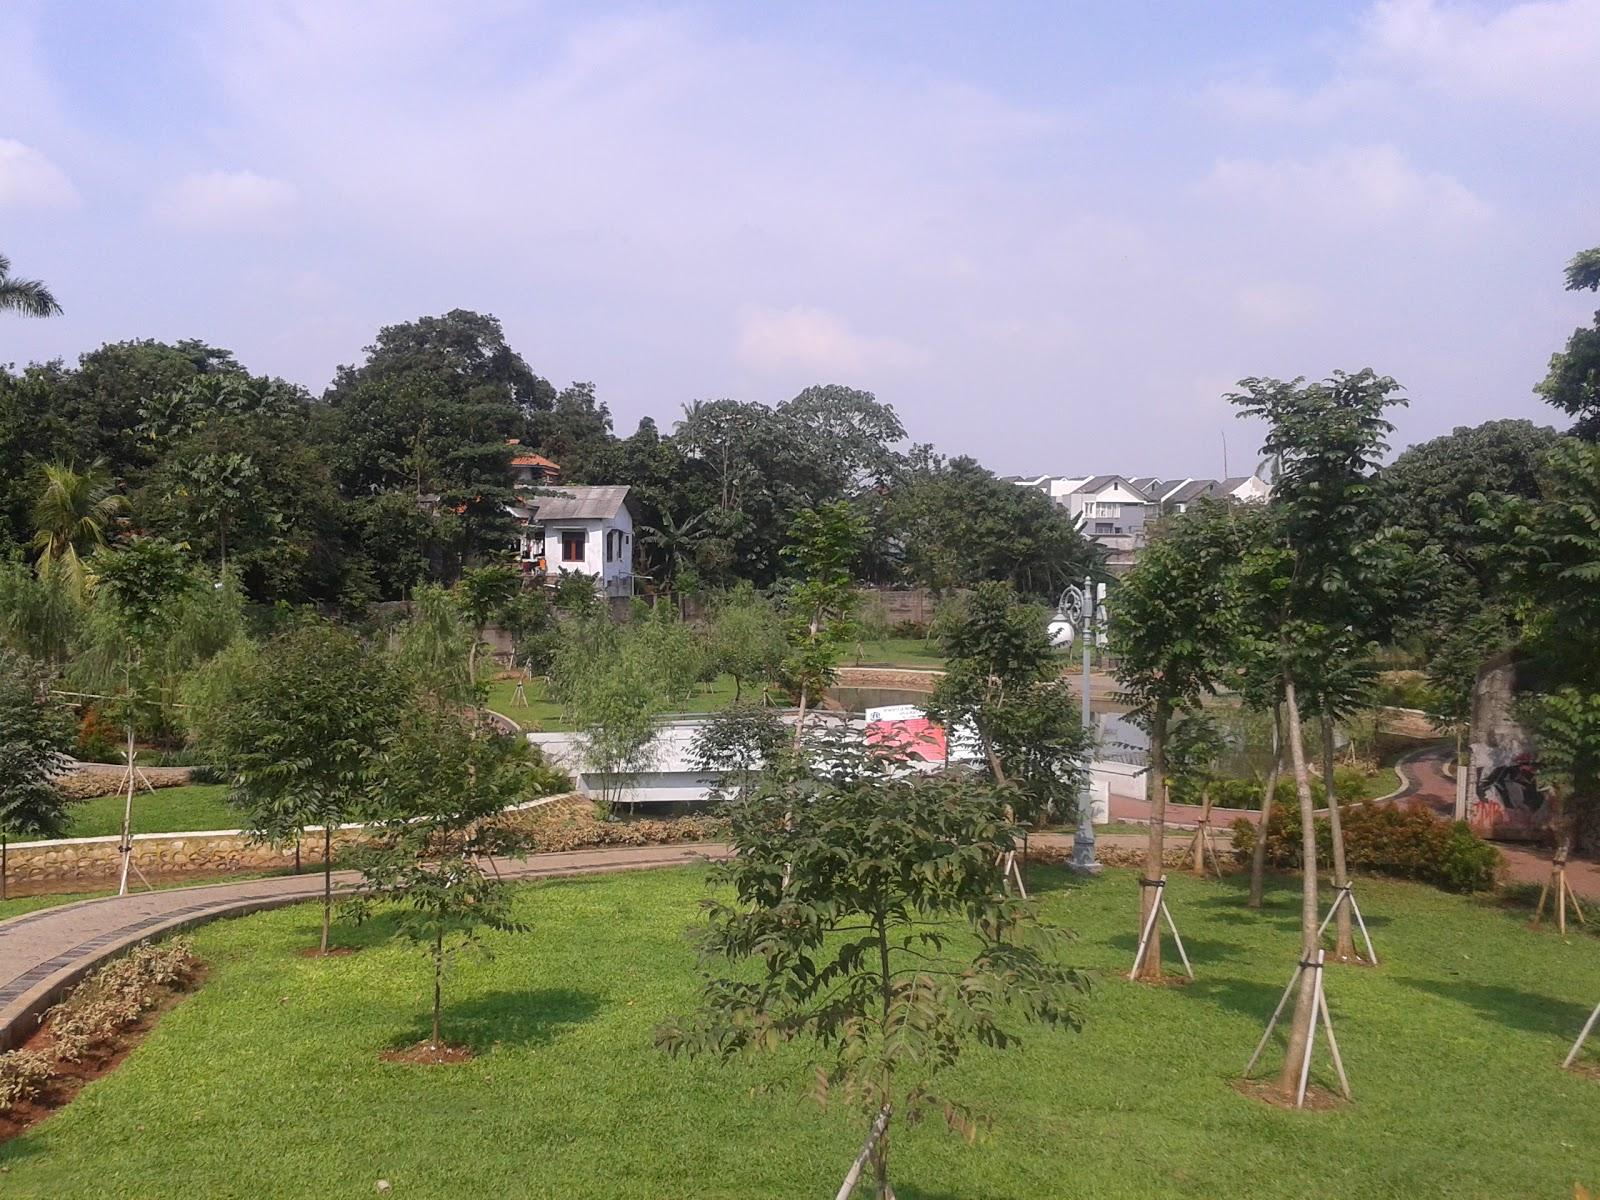 Taman Spathodea Oase Tengah Perkotaan World Rth Solusi Mengurangi Dampak